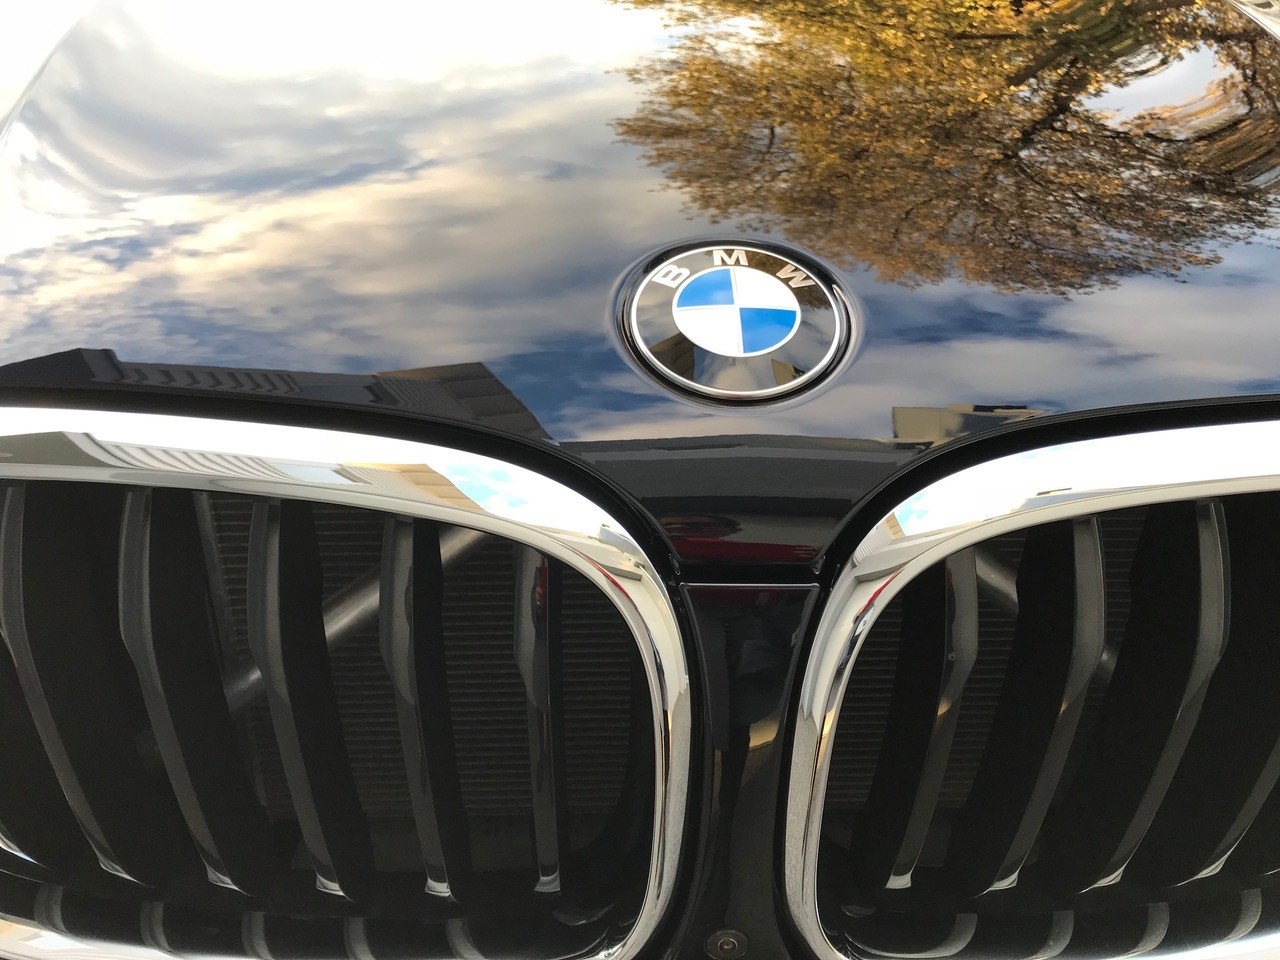 BMW X3 03  Vehcile Buying Service.jpg